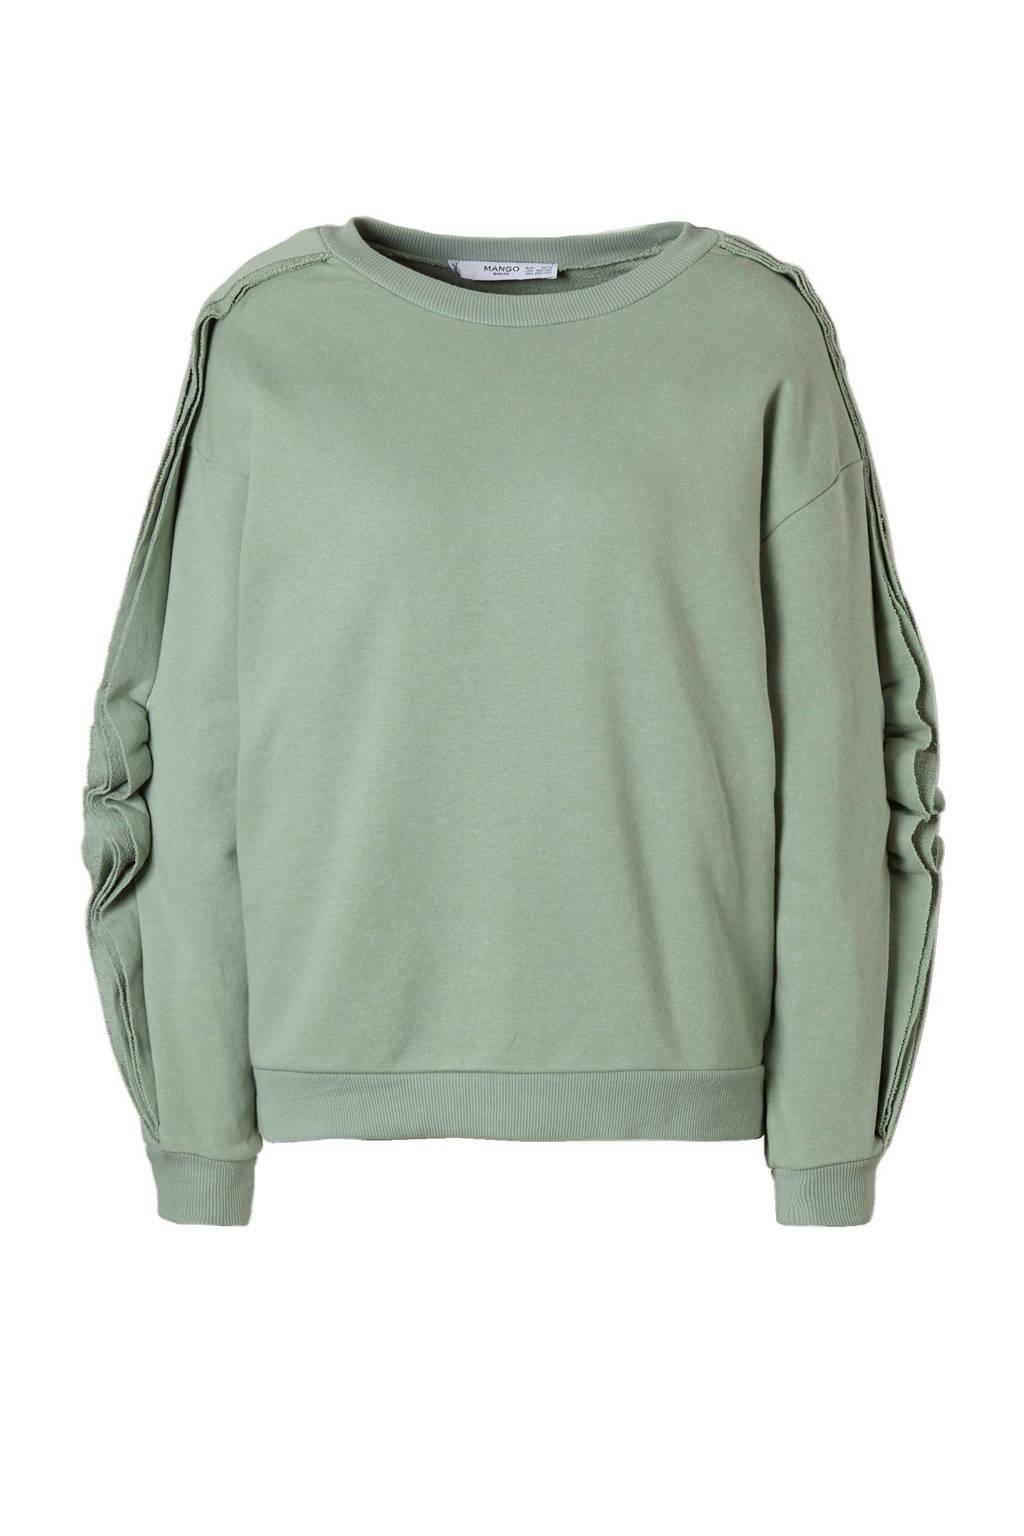 Mango sweater, Mintgroen